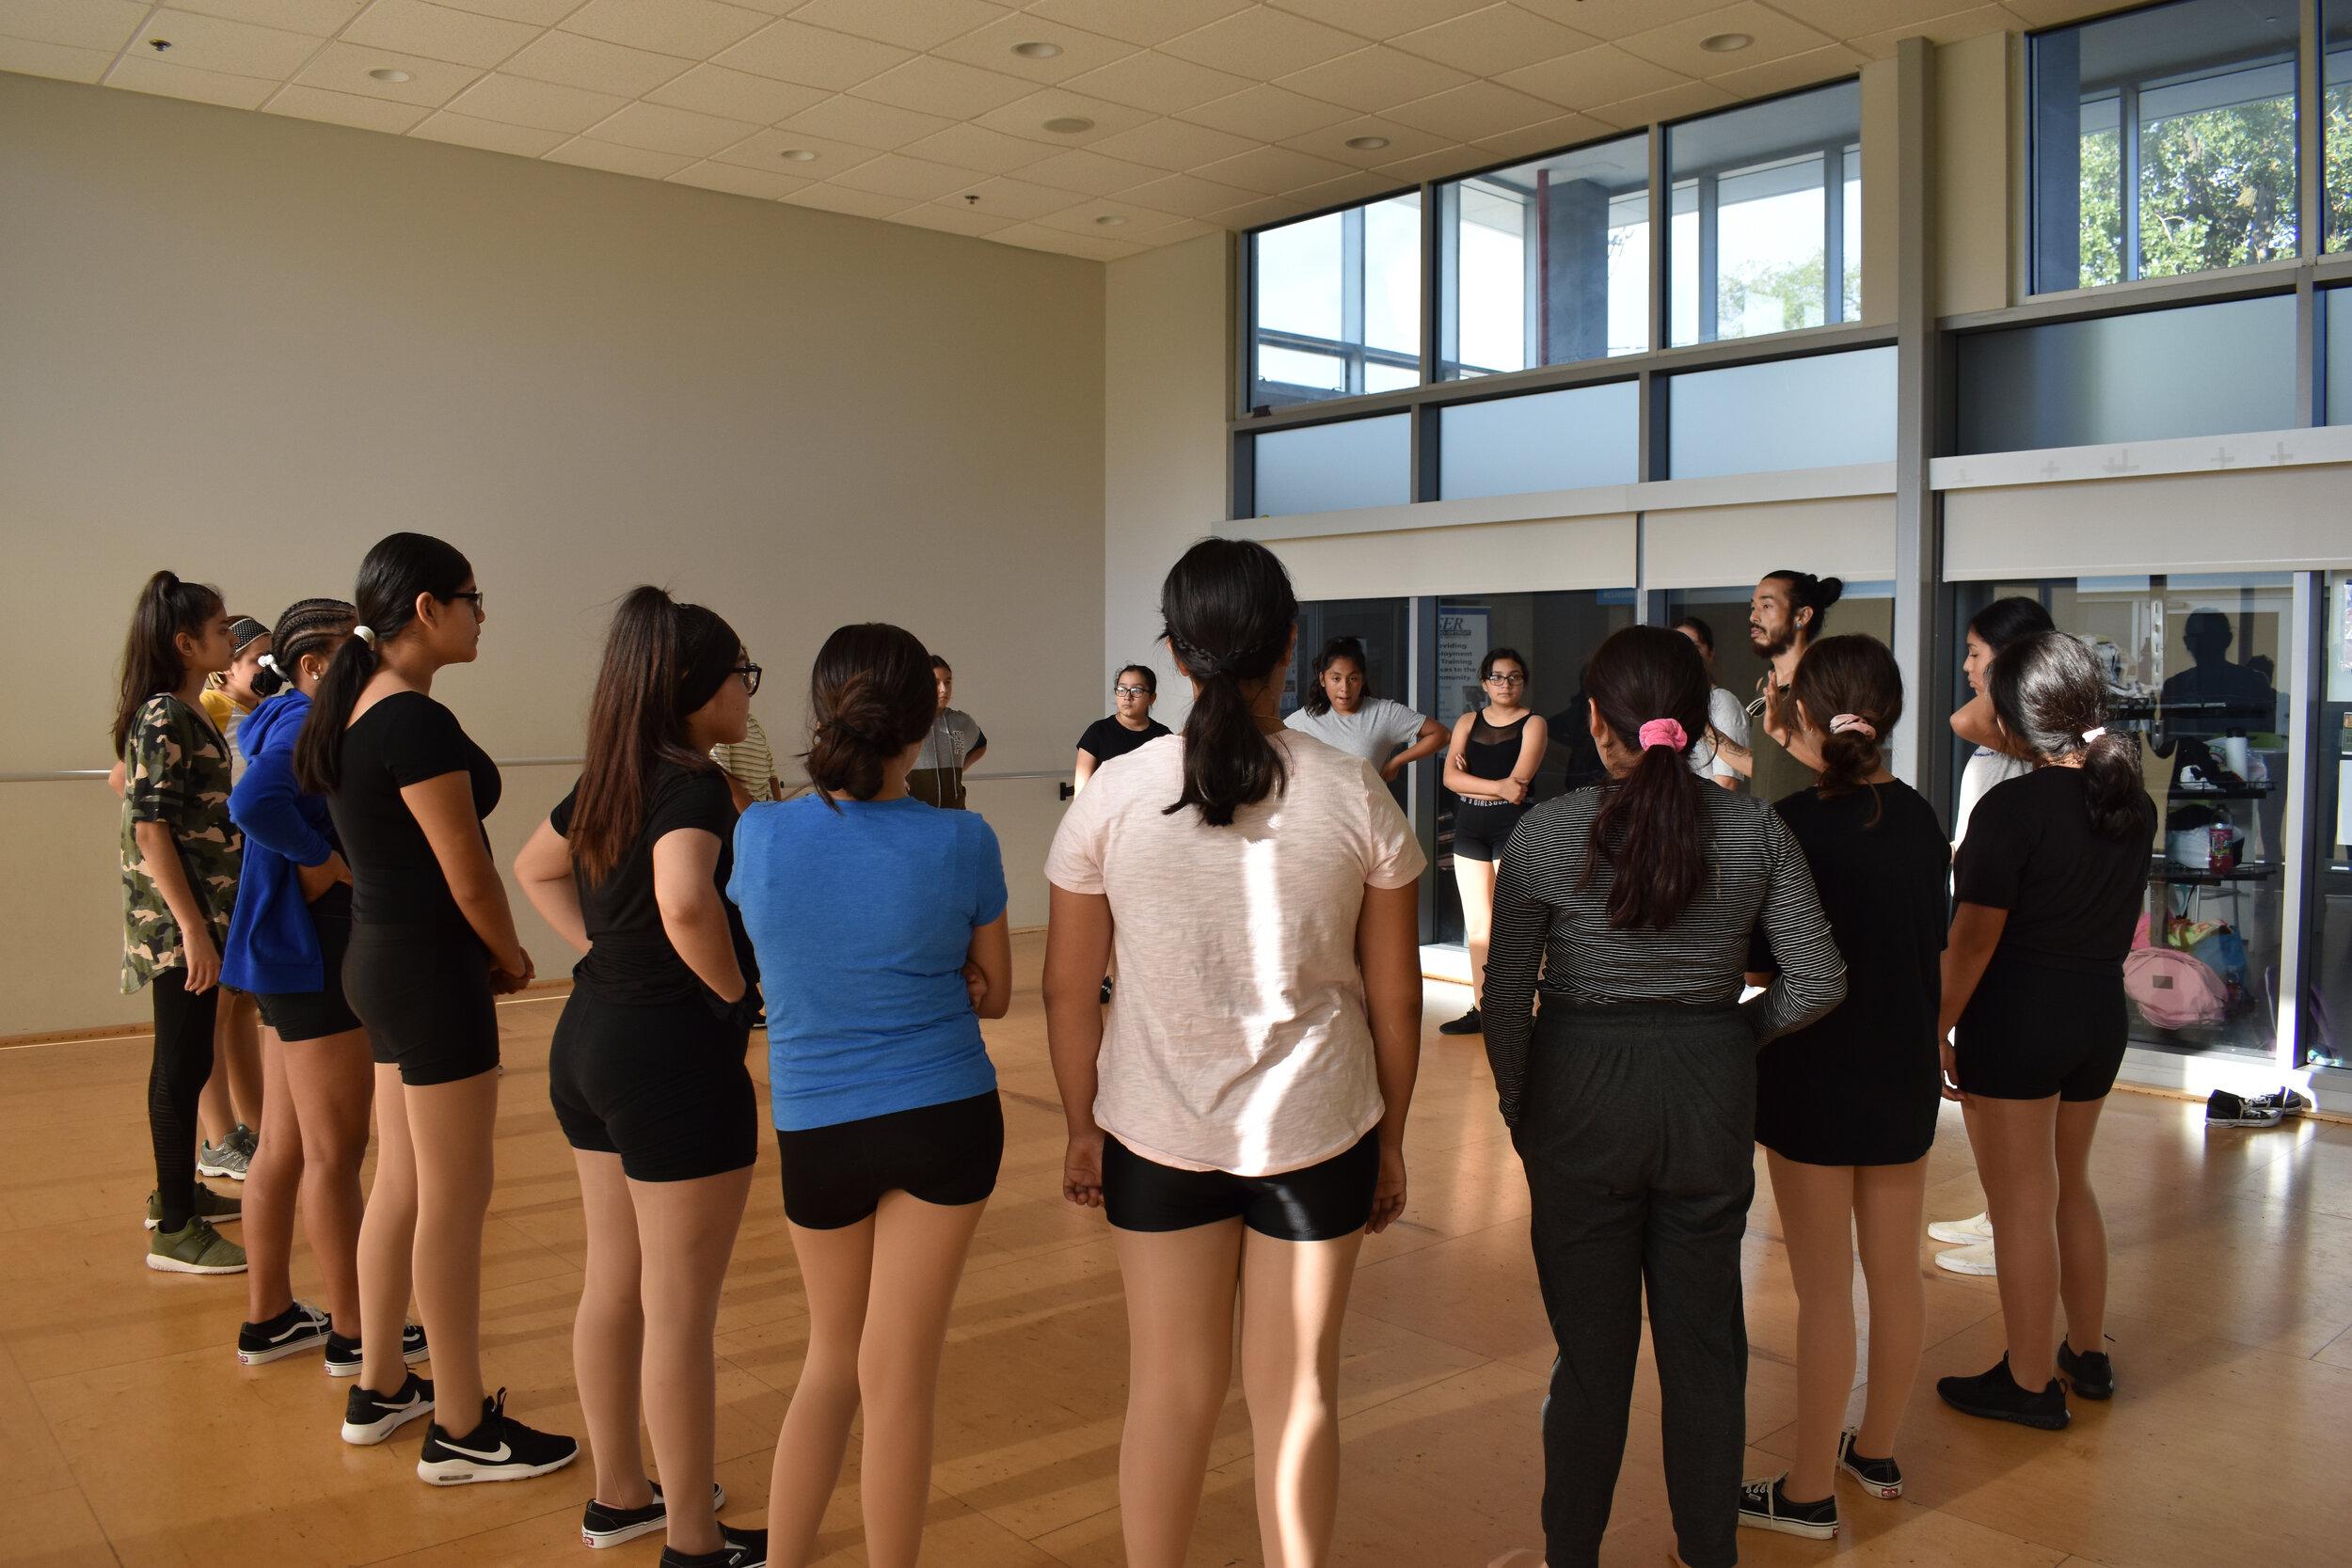 Street dance intensive led by Teaching Artist Daijiro Tsujima.